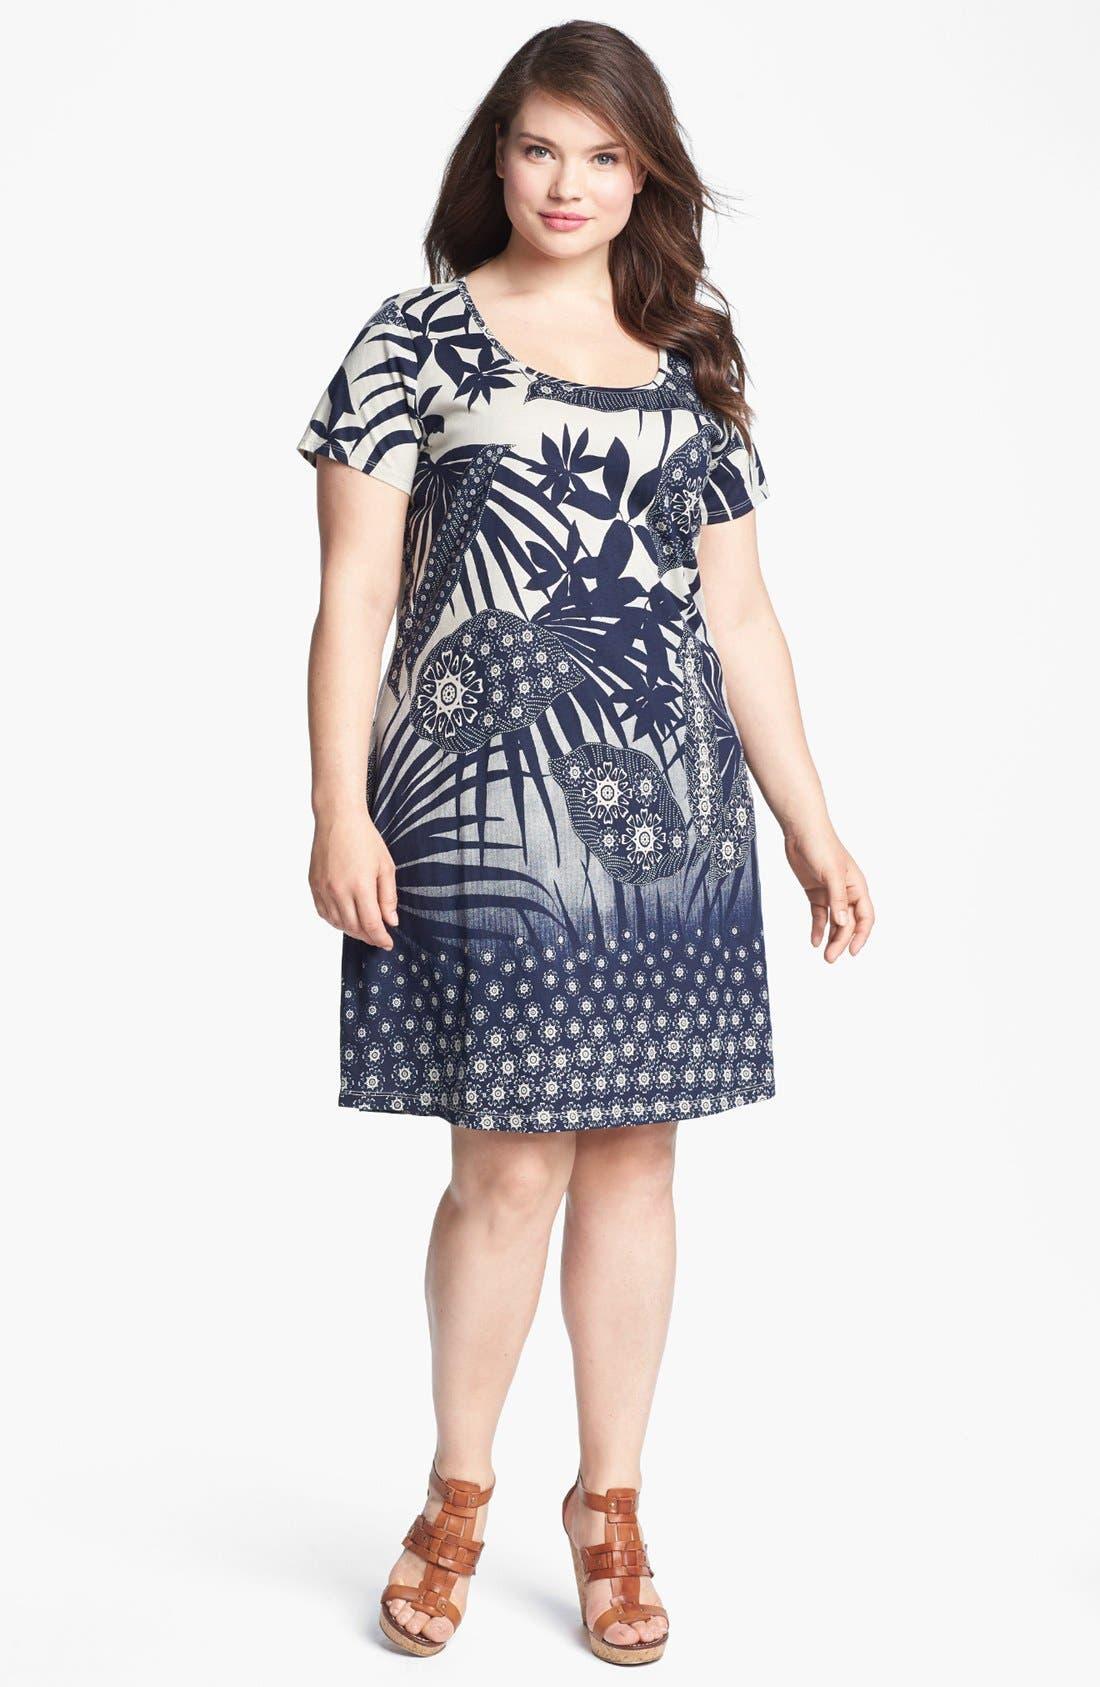 Alternate Image 1 Selected - Lucky Brand 'Chantal' Print Cotton Dress (Plus Size)